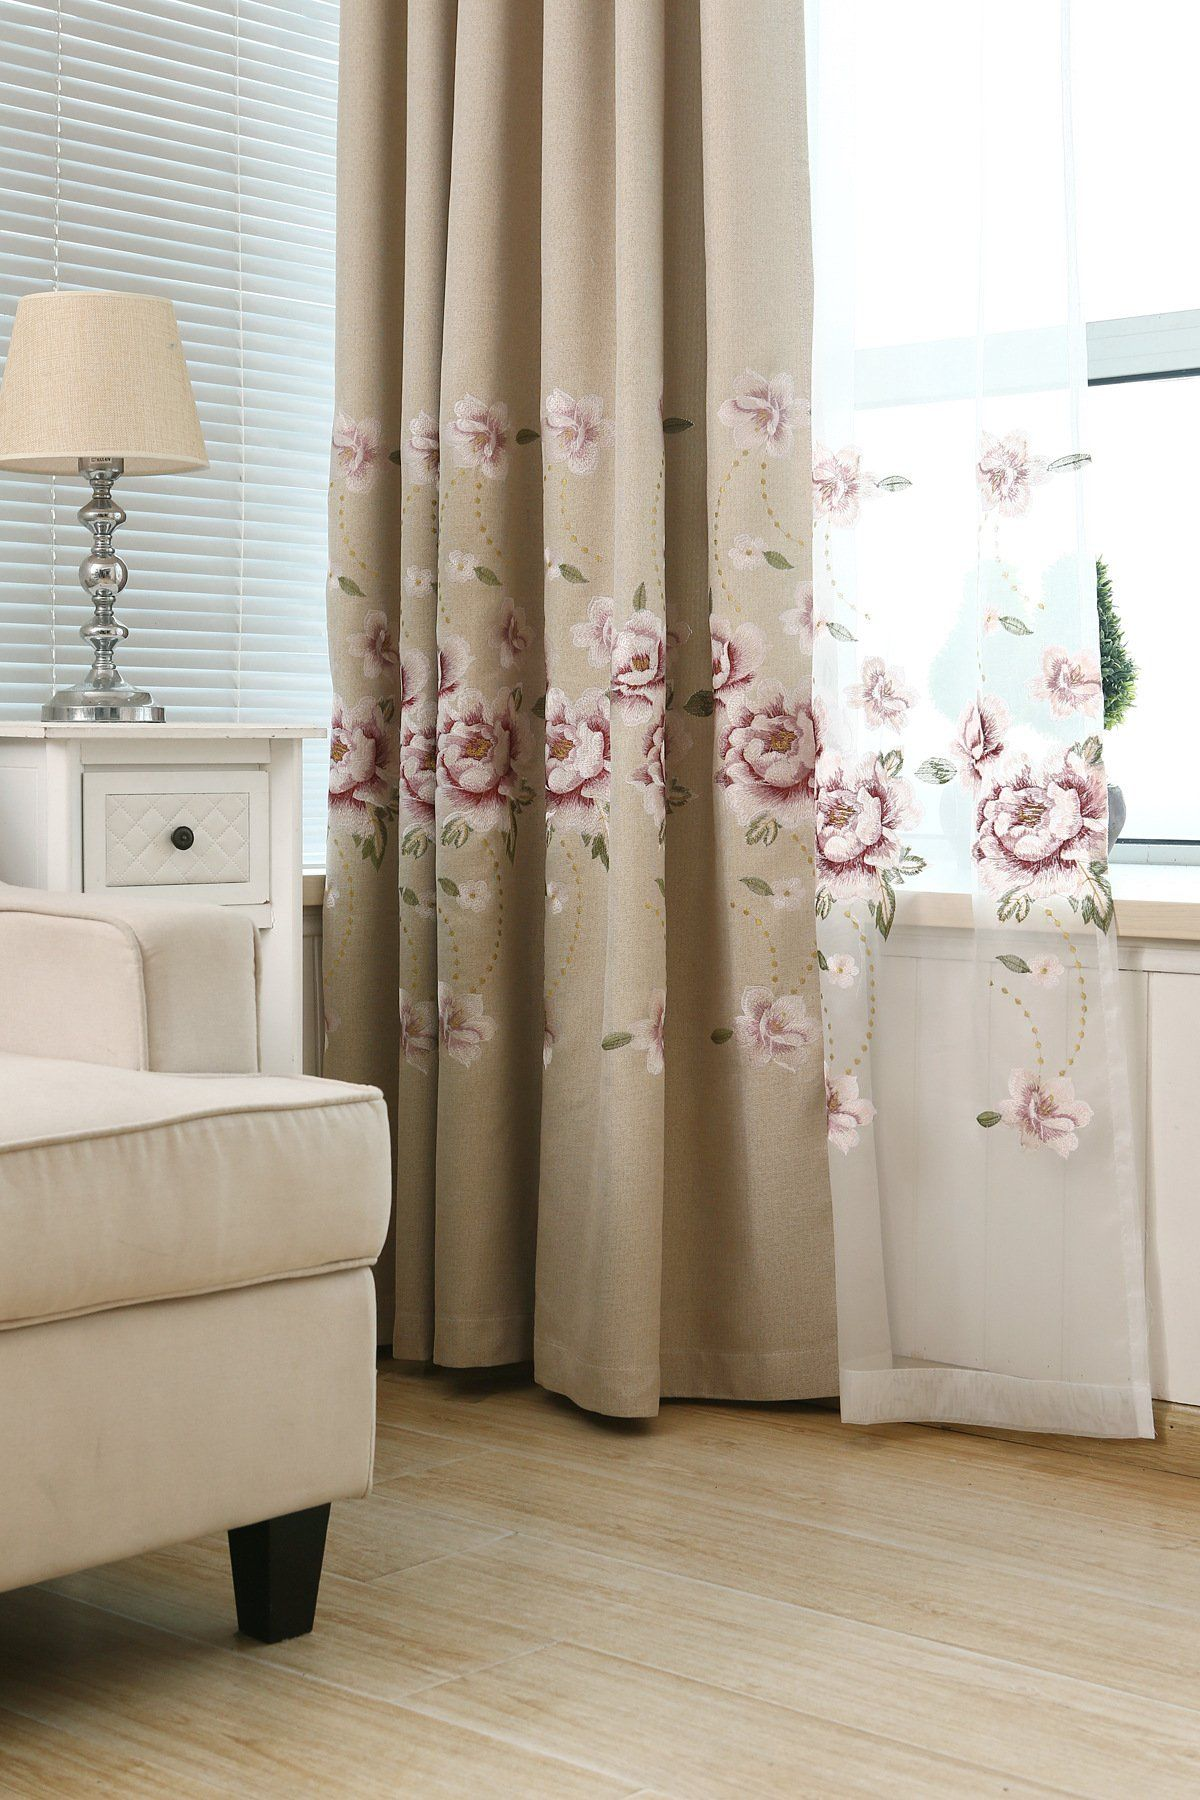 Pureaqu elegant embroidered floral blackout curtains room darkening